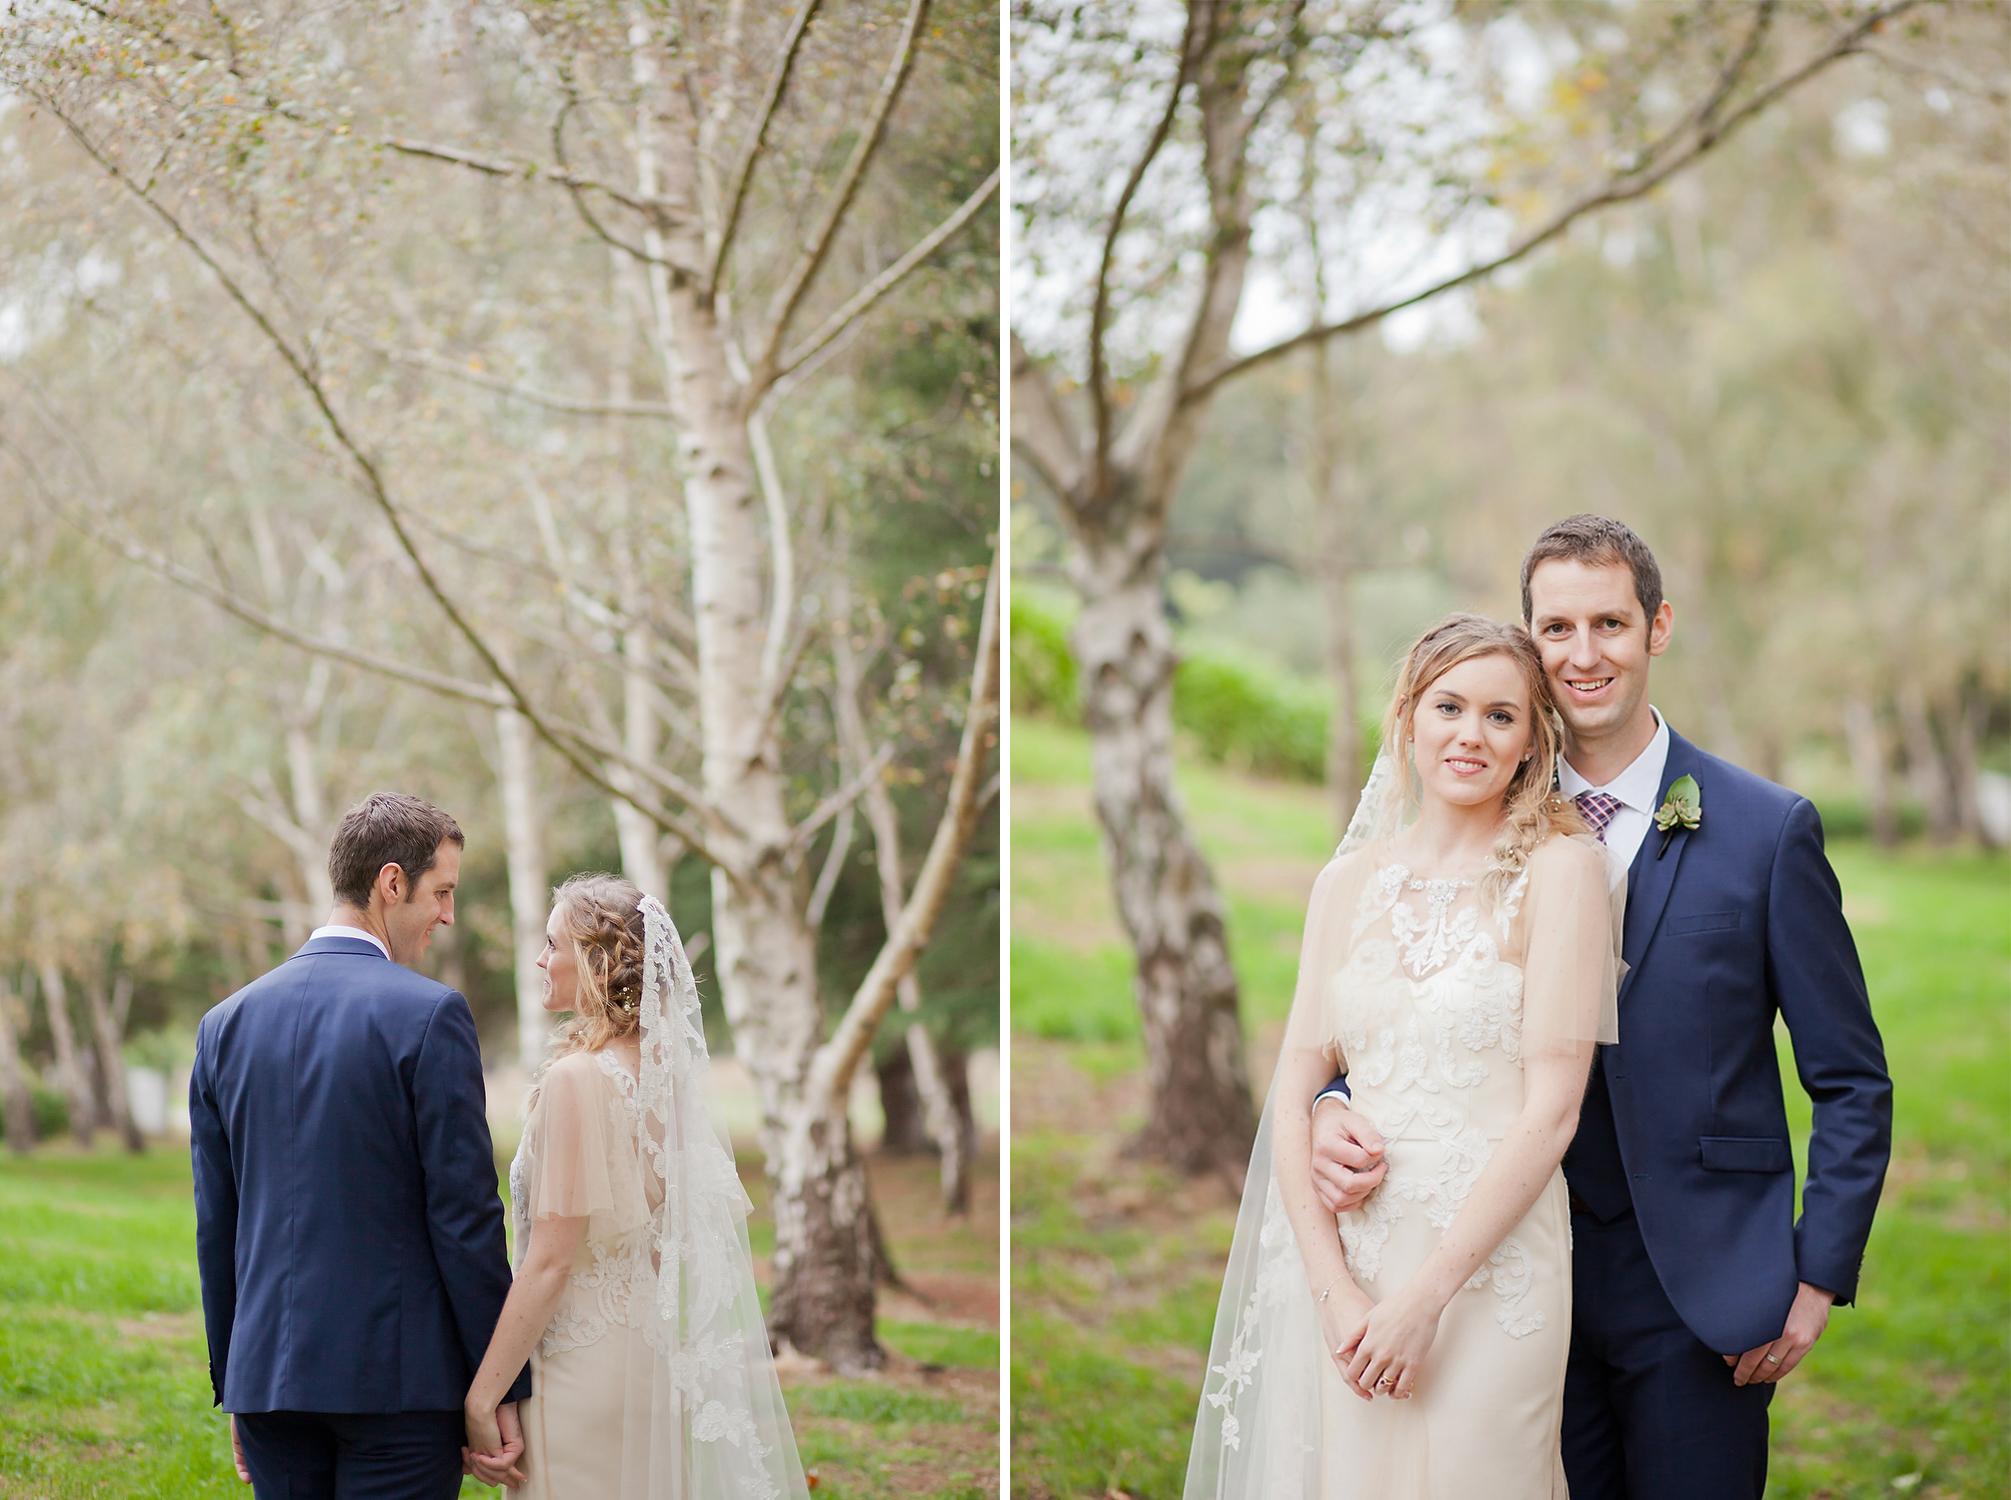 wellington wedding photography NZ - 1428.JPG